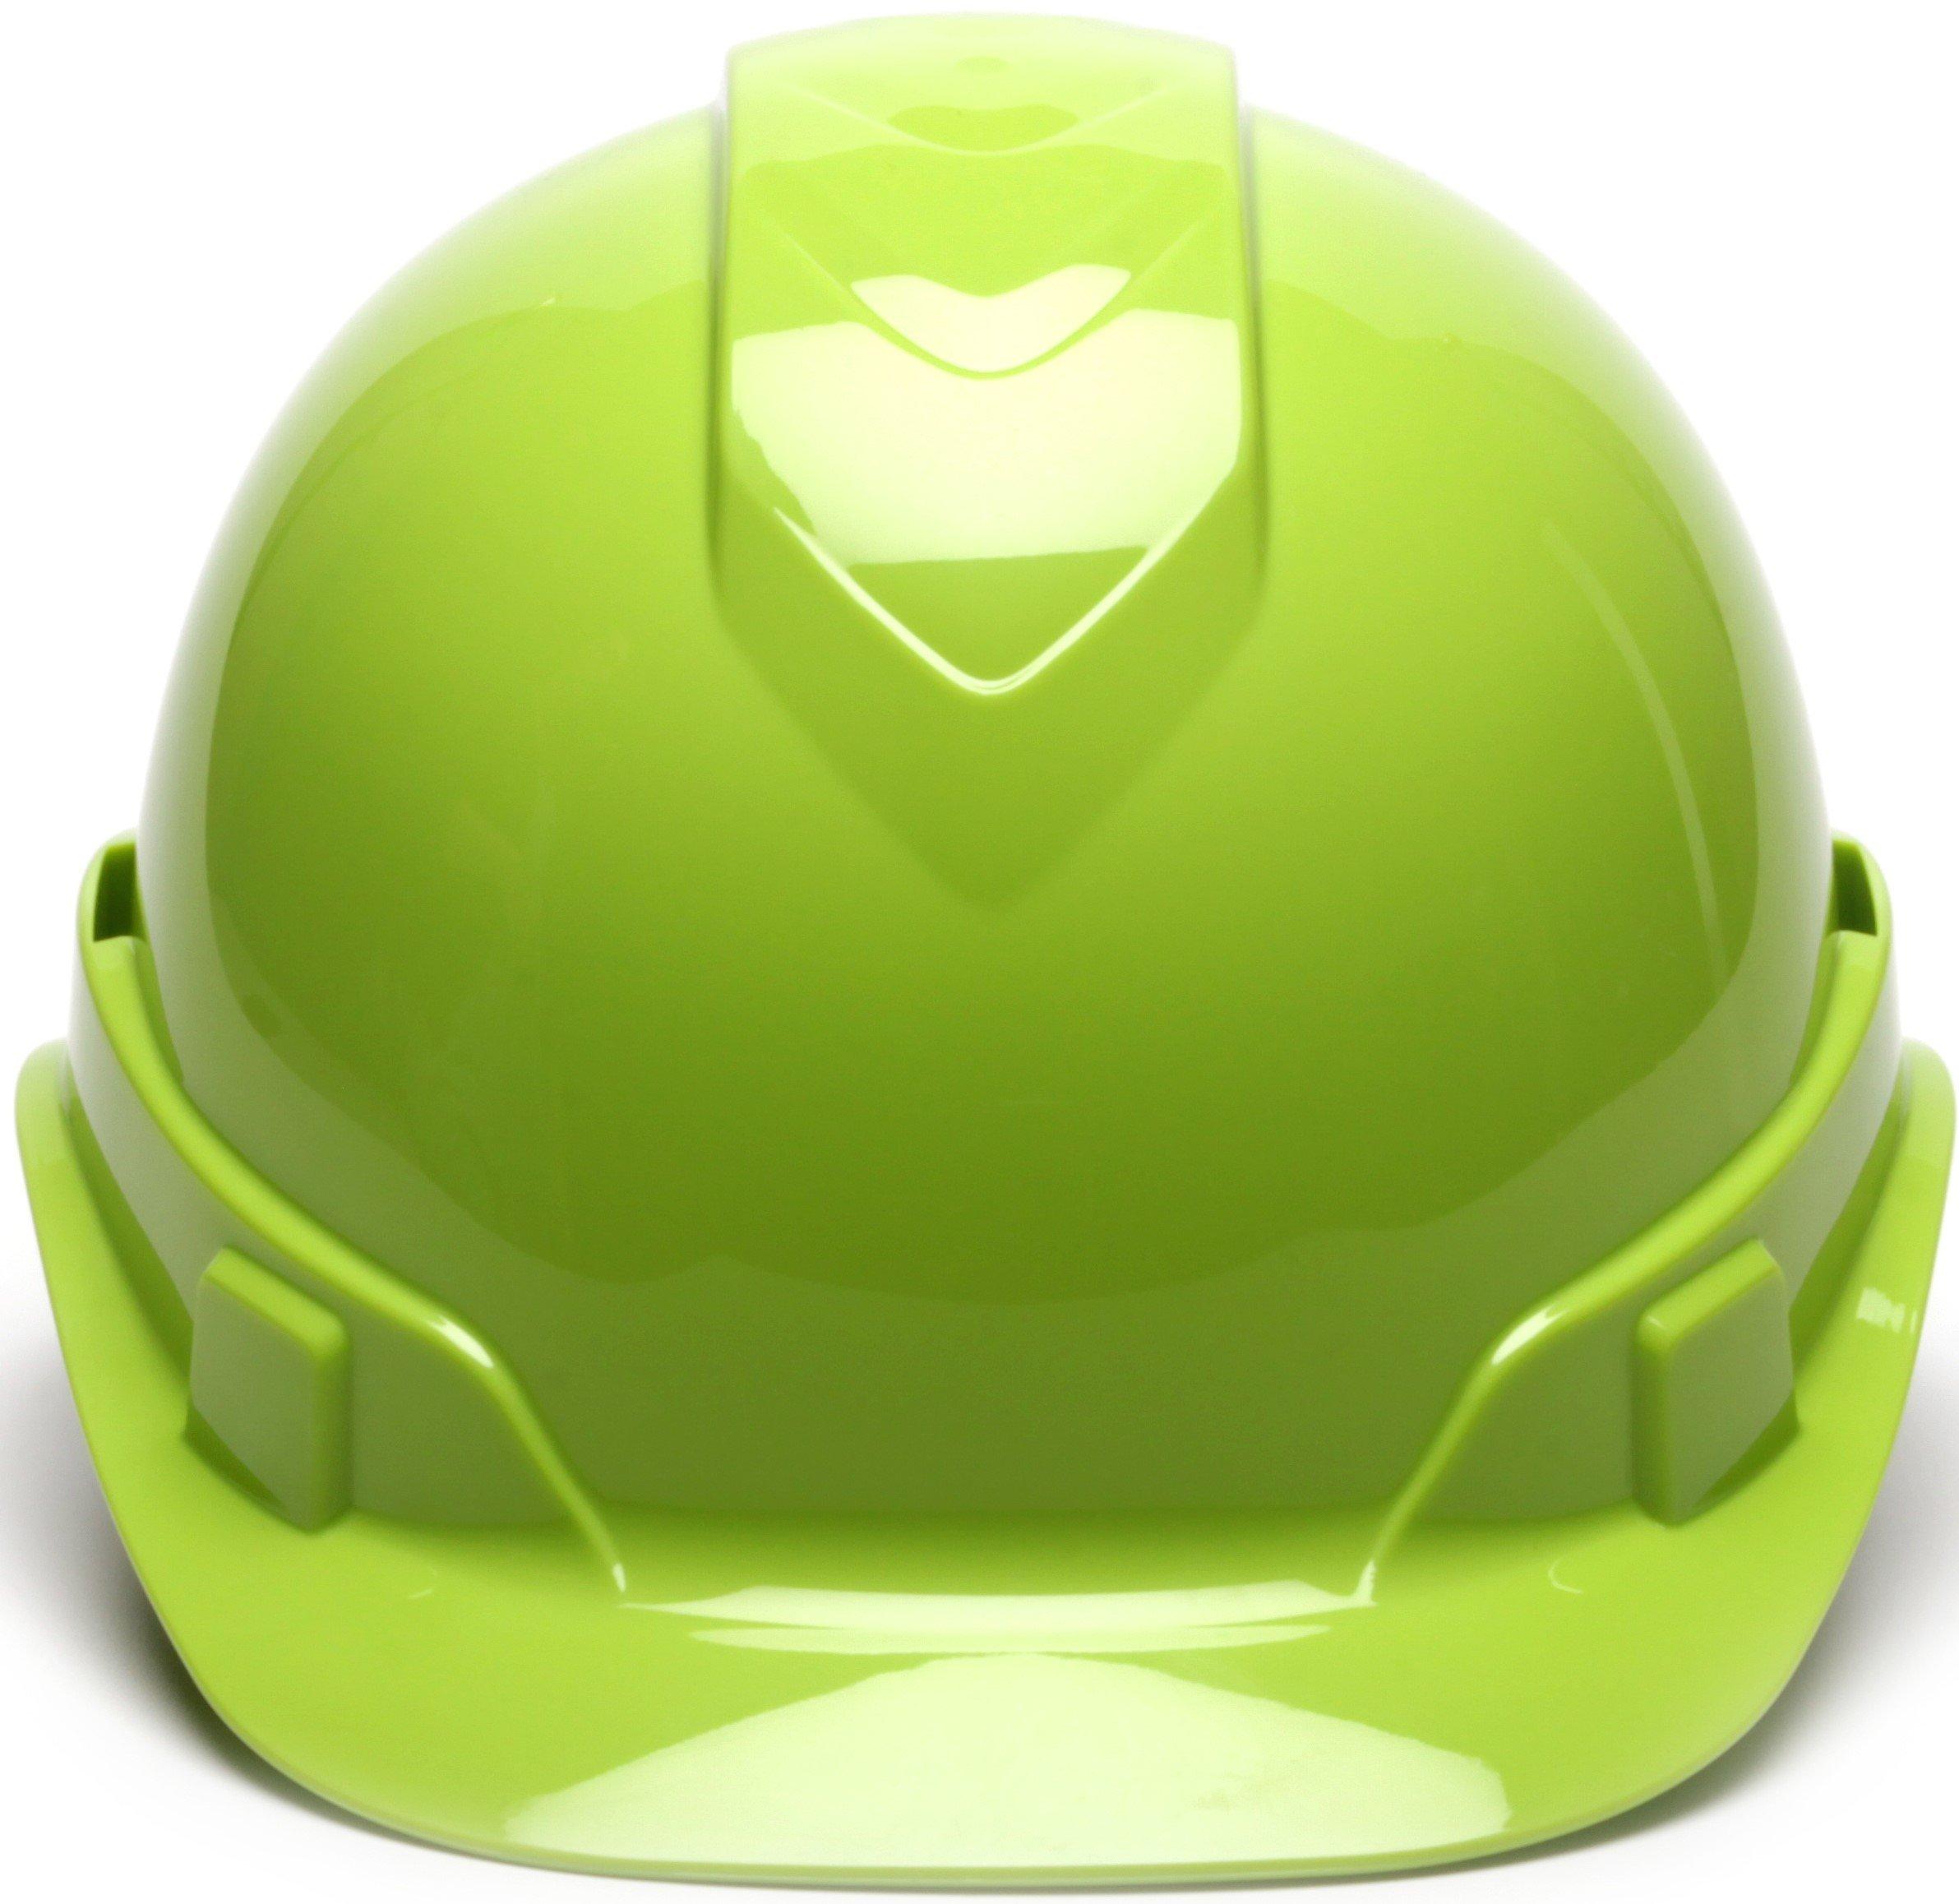 Pyramex Ridgeline Cap Style Hard Hat, 6 Point Ratchet Suspension, Hi Vis Lime by Pyramex Safety (Image #2)